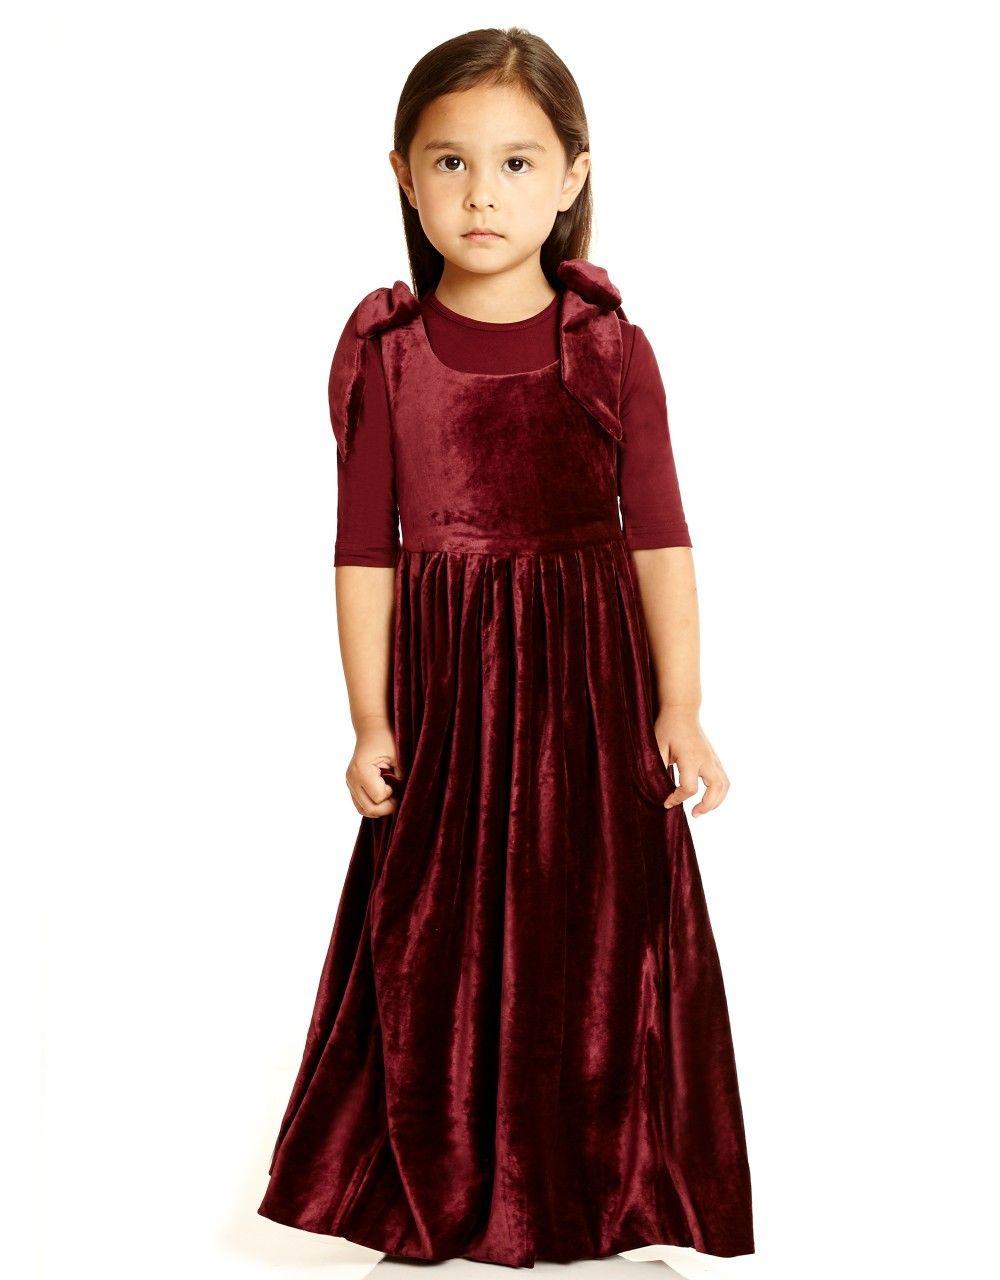 508dee0c7d71 Kids Velour Maxi Jumper with Shoulder Bows | Charming Kids Clothes ...